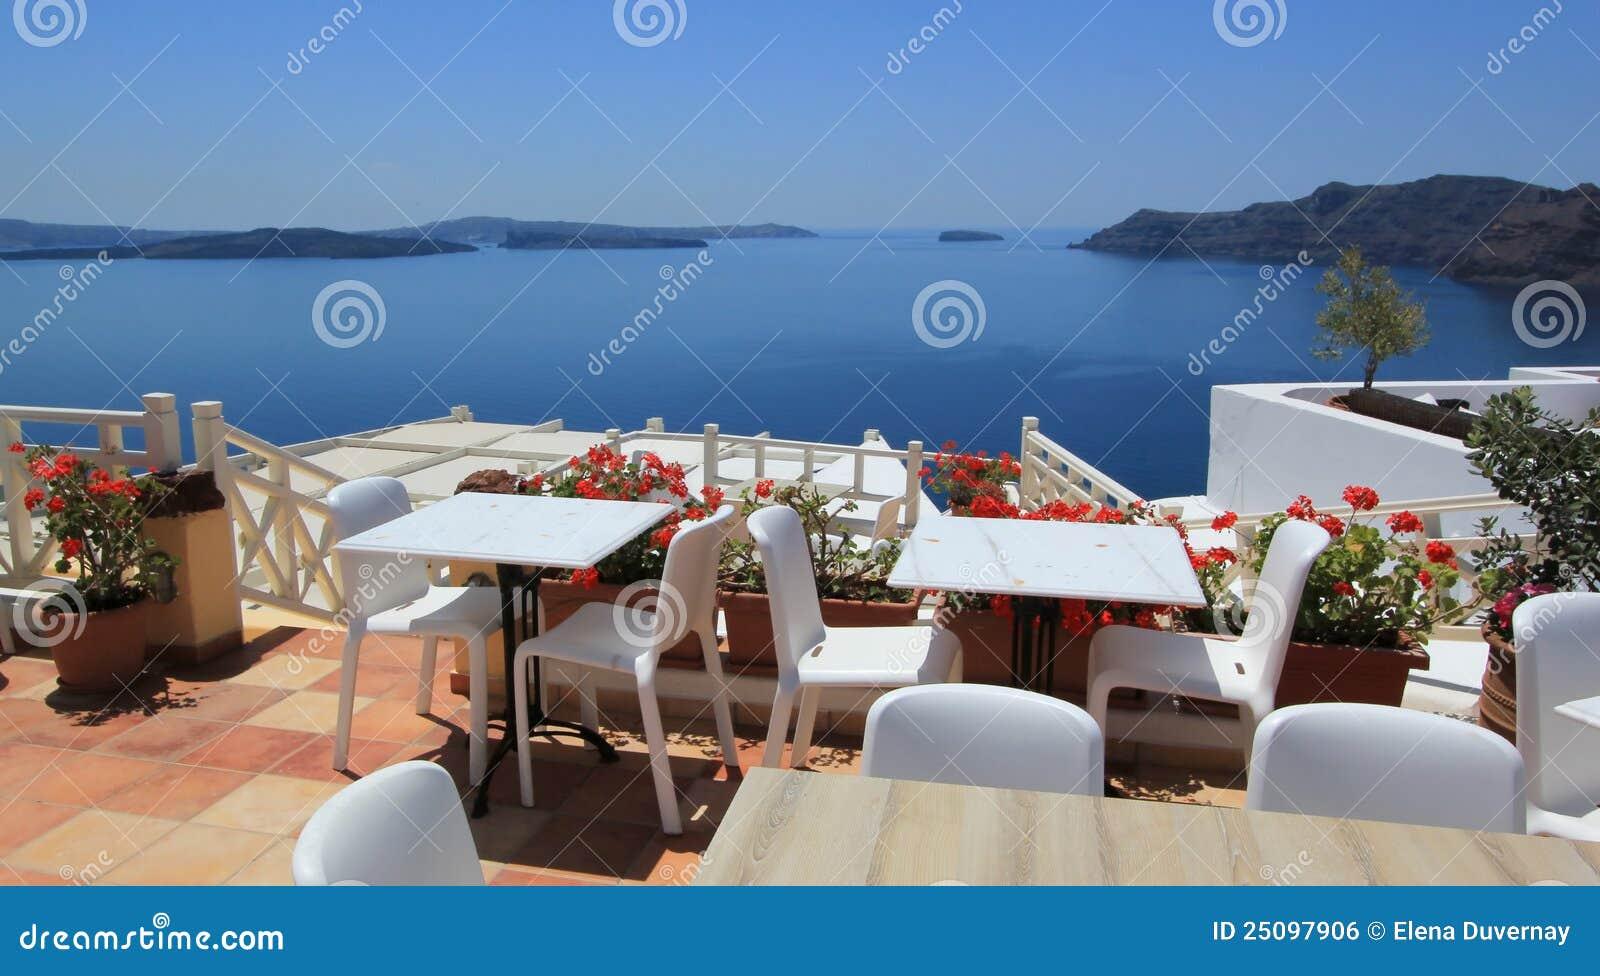 Restaurant balcony santorini greece stock photo image for Restaurants with balcony